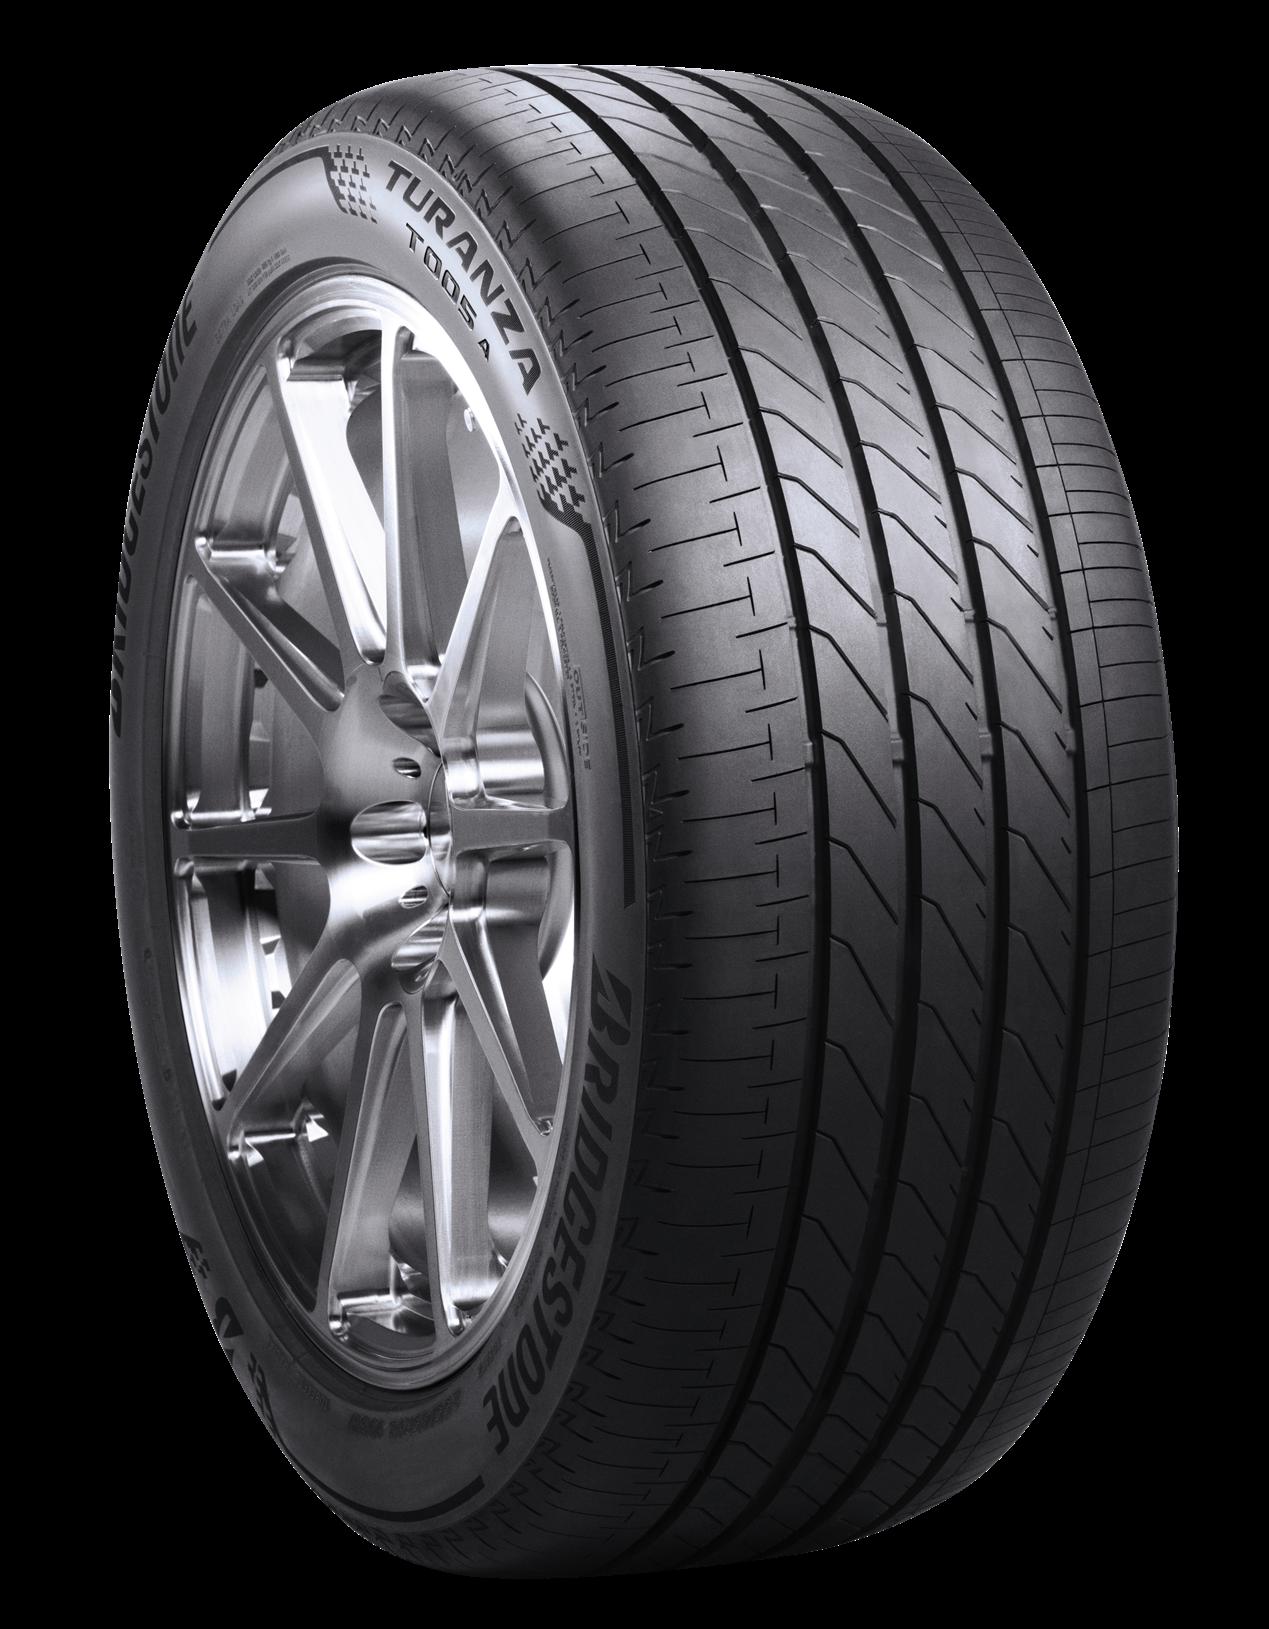 Car Suv Truck Commercial Motorcycle Tyres Bridgestone Ban Mobil Techno Sport 195 50 R16 Vocer Turanza T005a